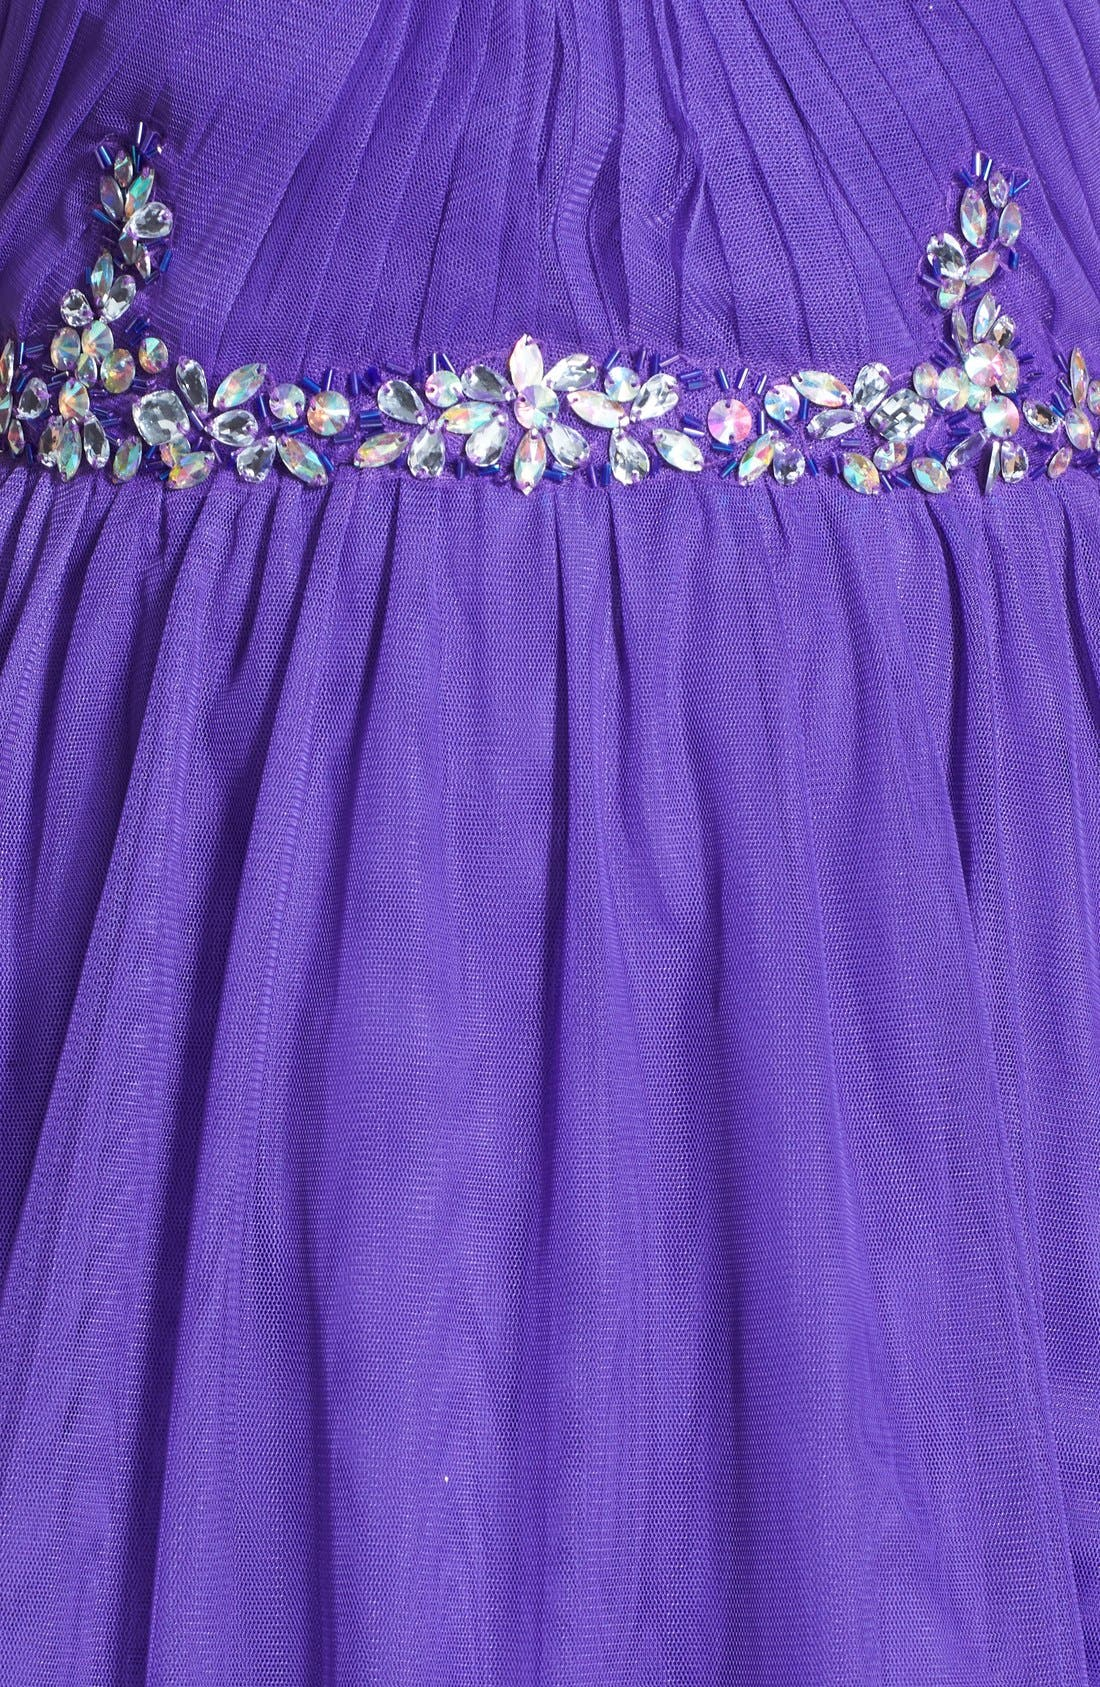 Embellished Party Dress,                             Alternate thumbnail 3, color,                             500